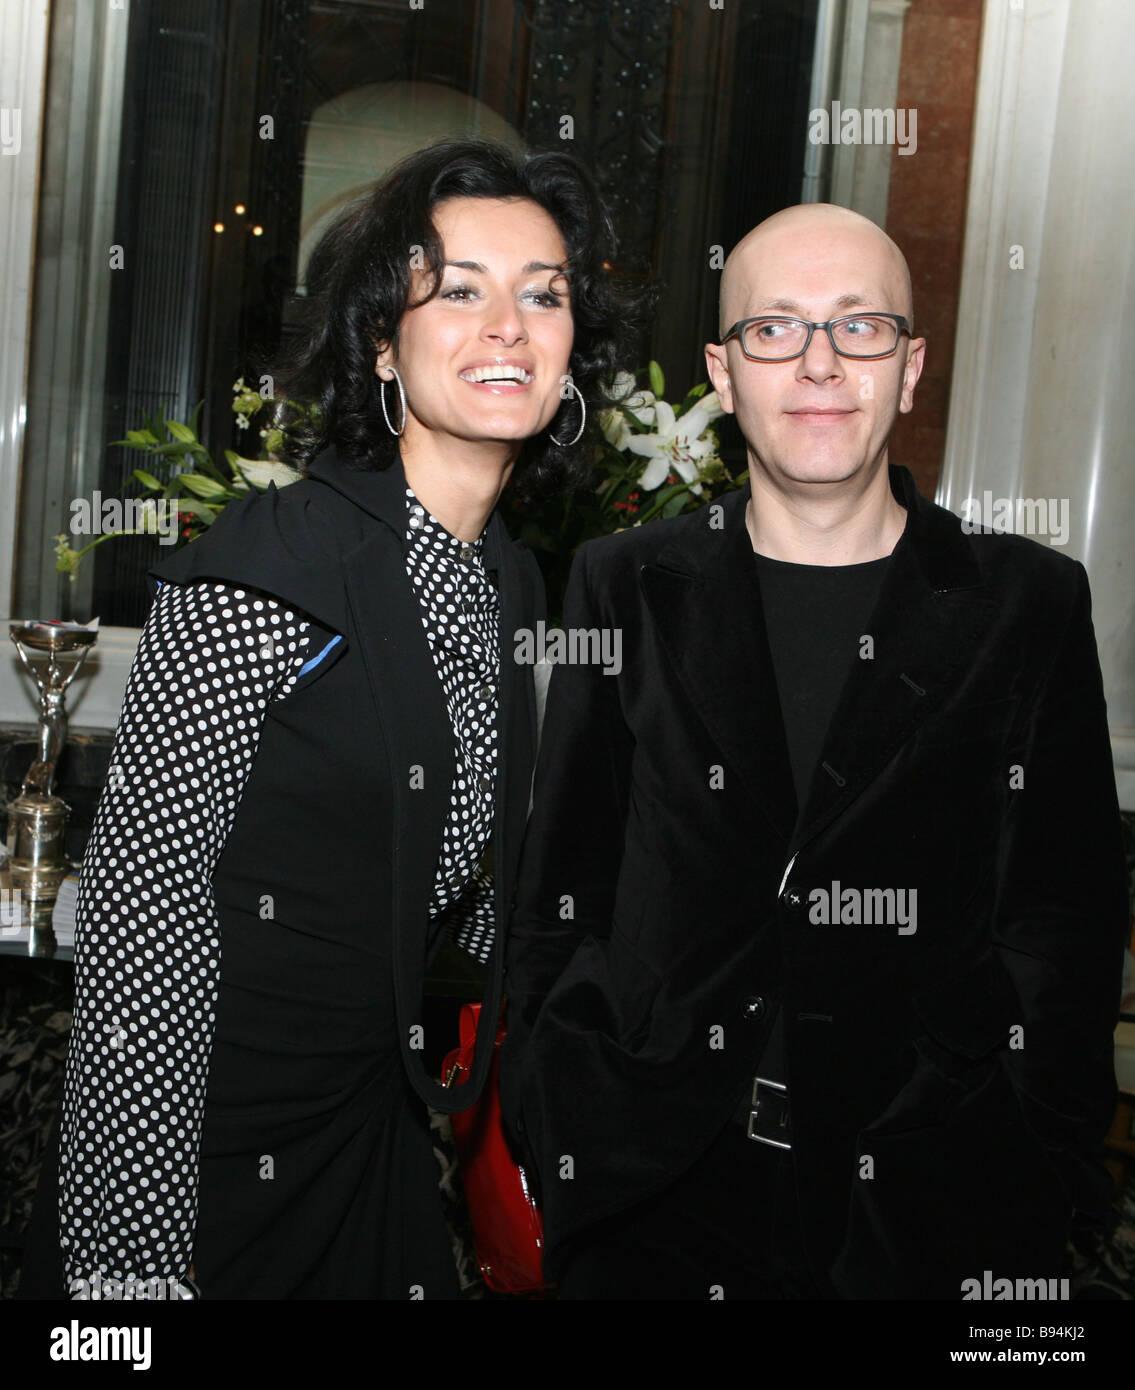 TV presenter Tina Kandelaky and Azamat Tseboyev the editor in chief of the Menyu udovolstviy magazine during a reception - Stock Image